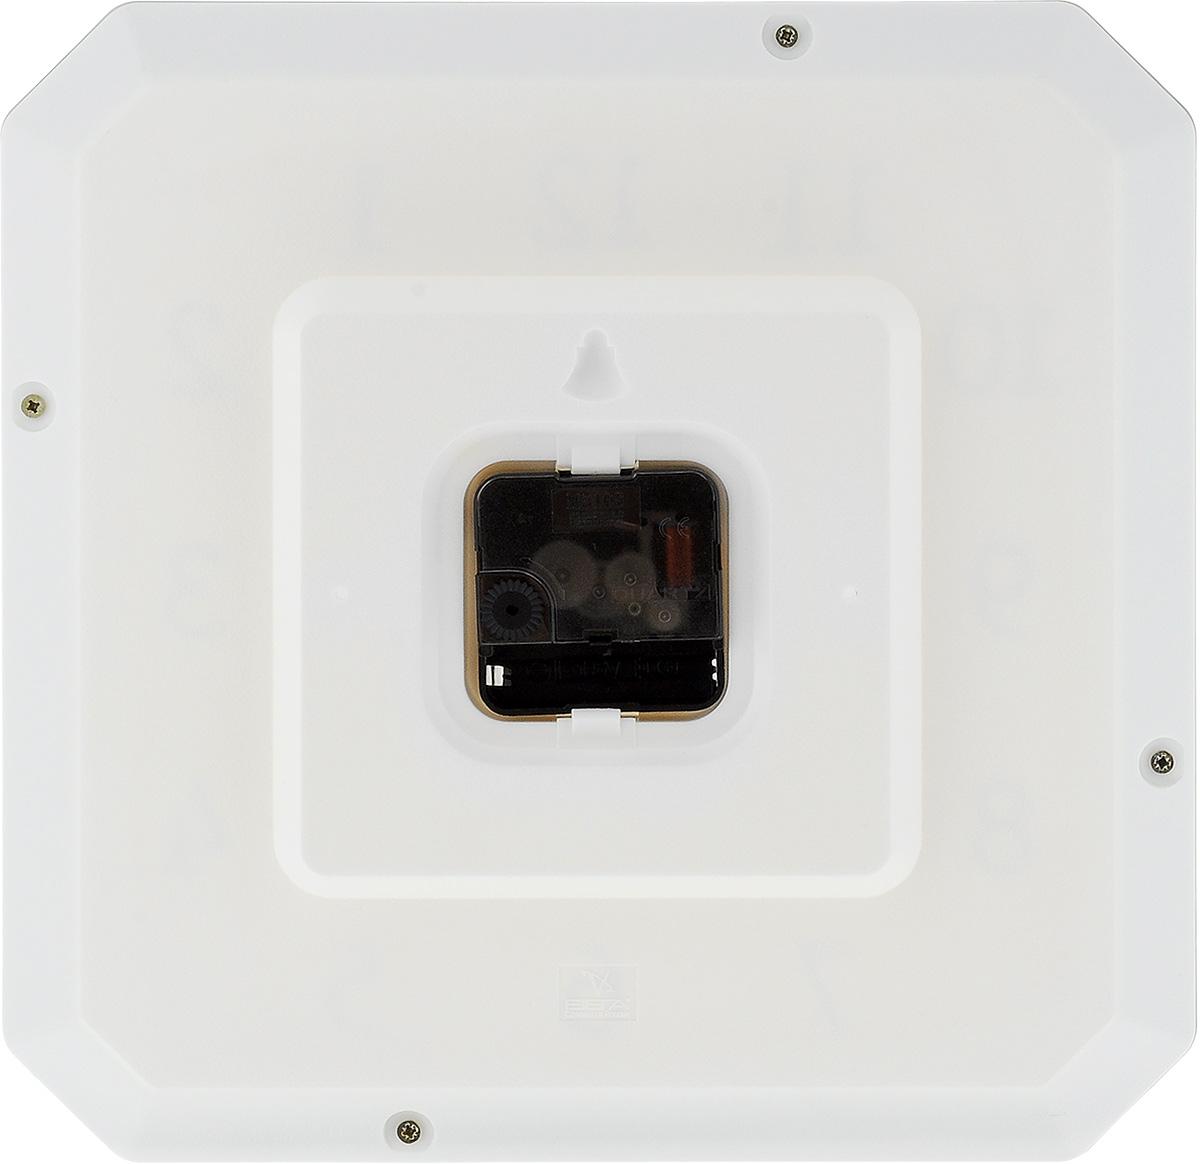 "Часы настенные Вега ""Классика"", цвет: серый, белый, 27,5 х 27,5 см"